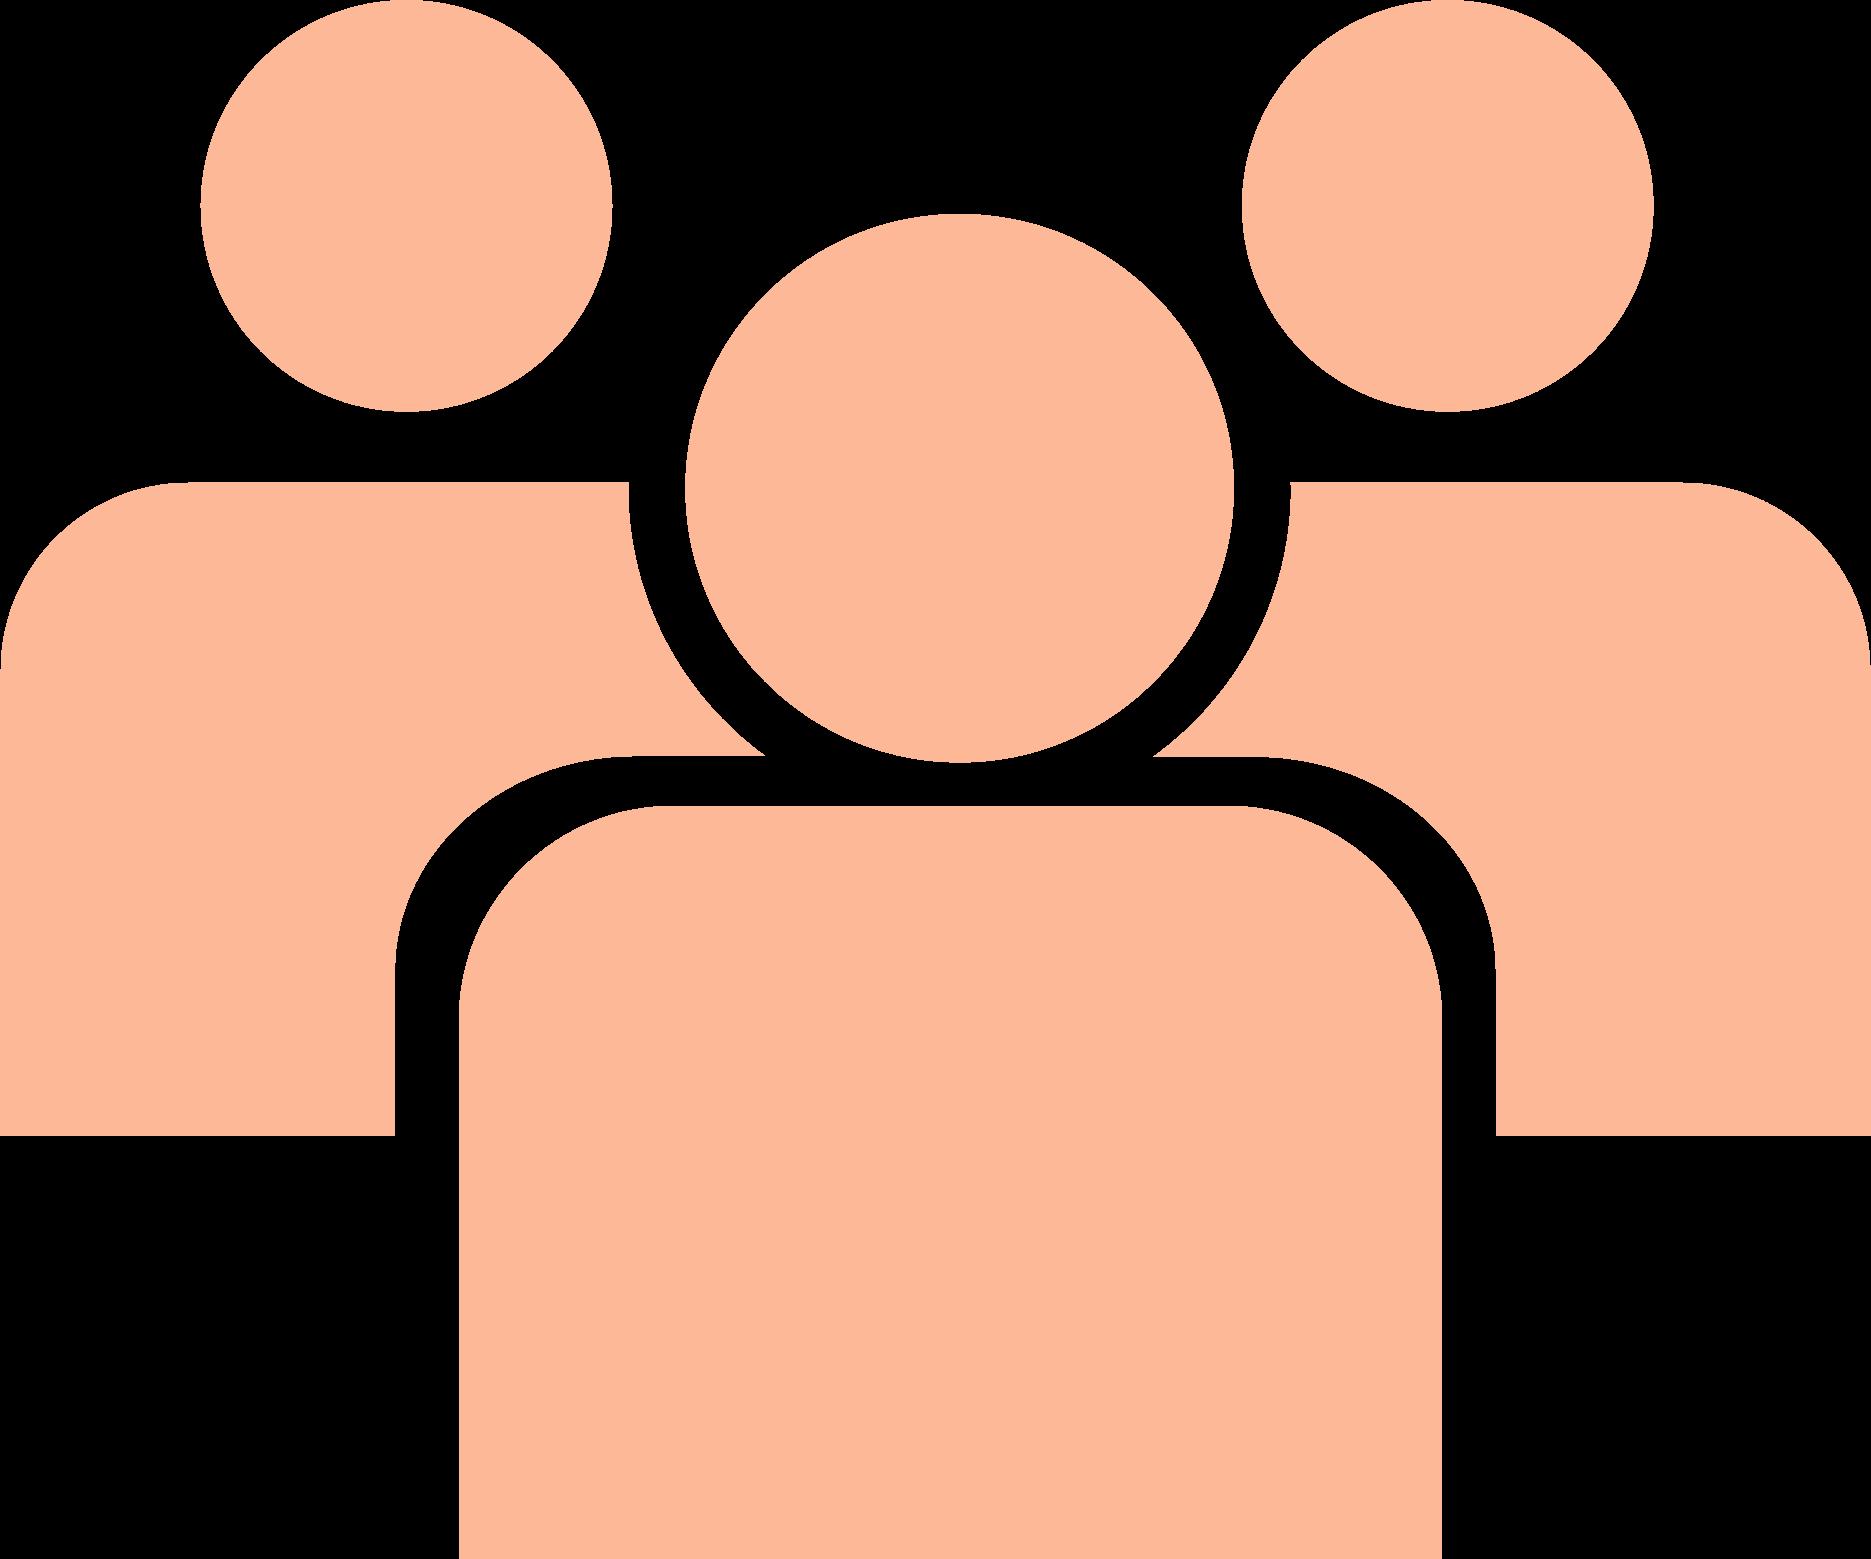 Community_Noun_project_2280.png